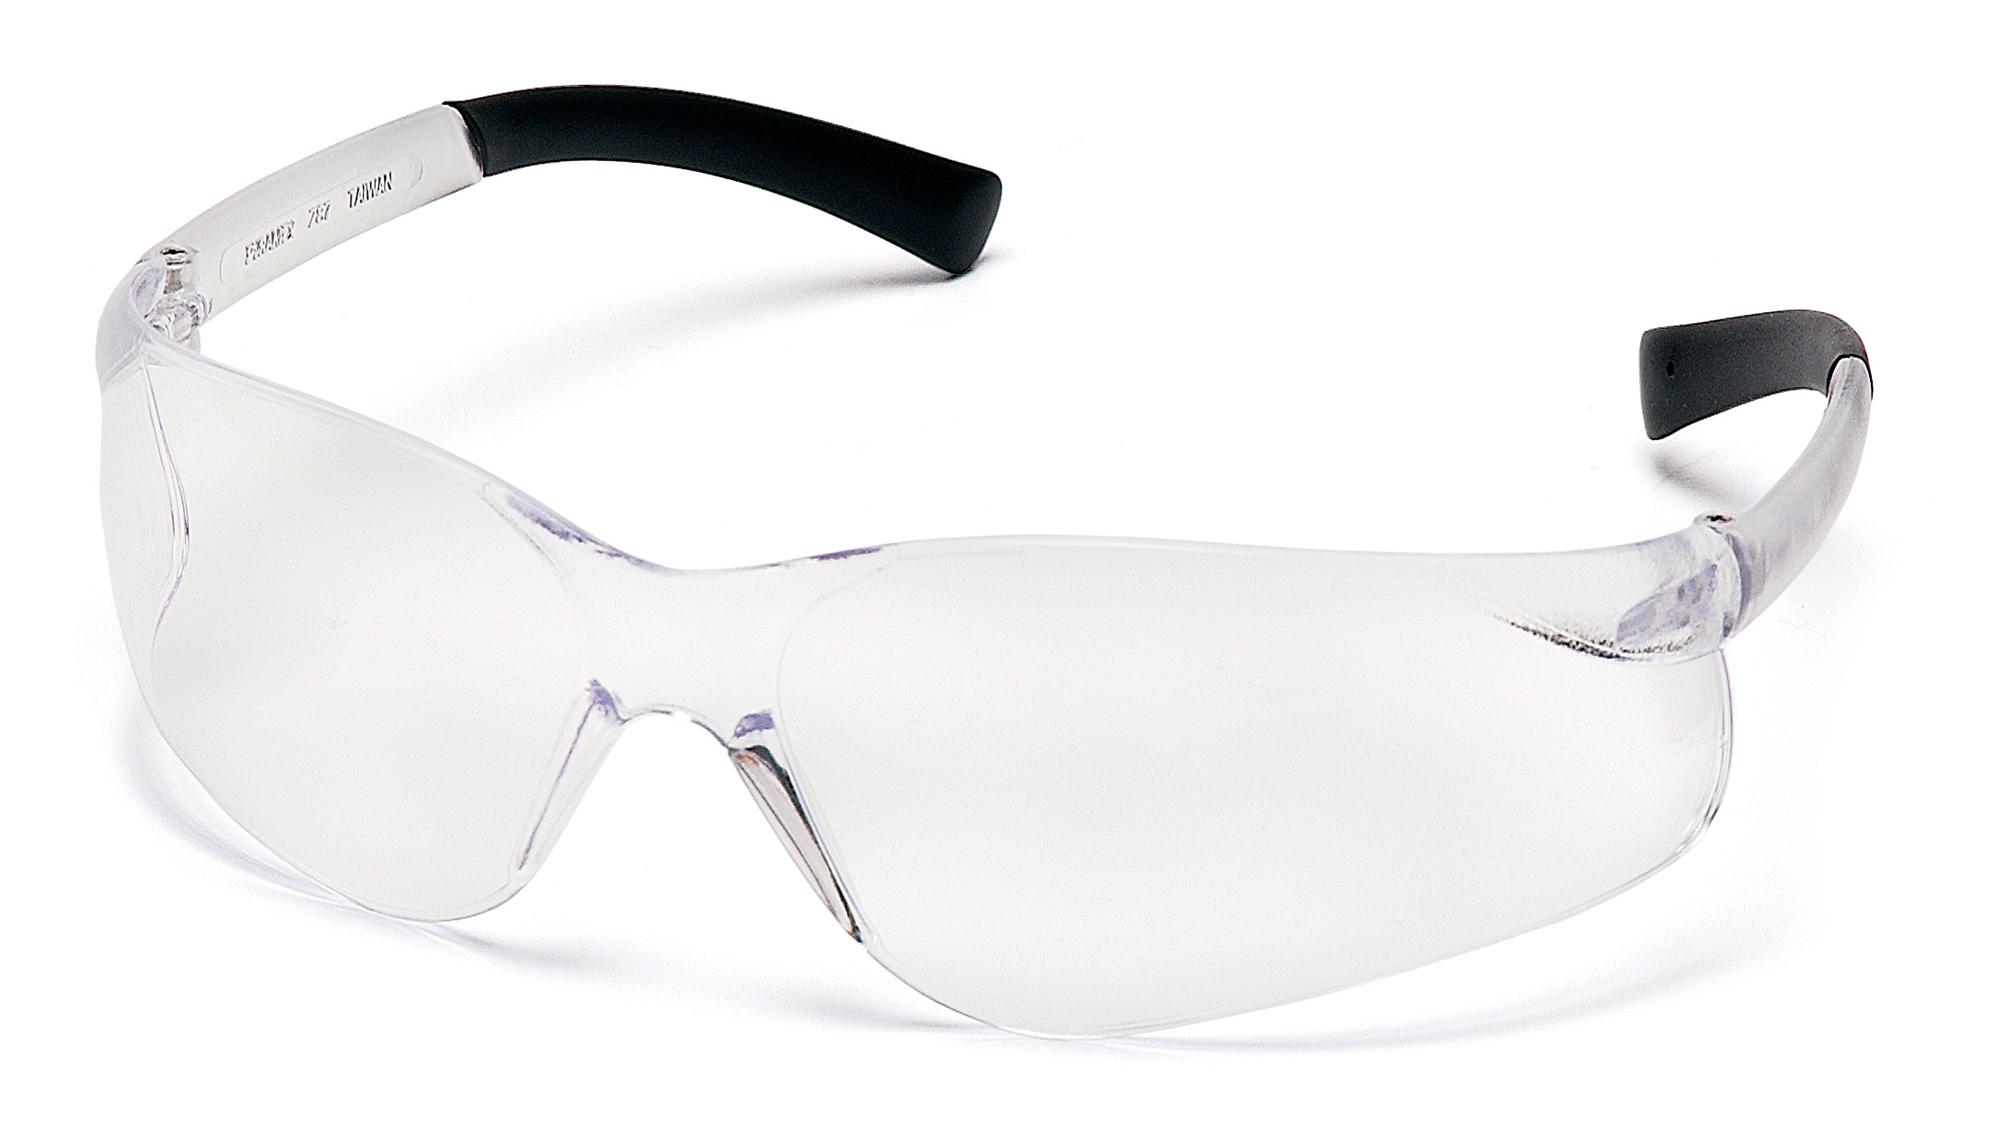 e90803771b3 Pyramex Ztek Safety Glasses - Clear Anti -Fog Lens